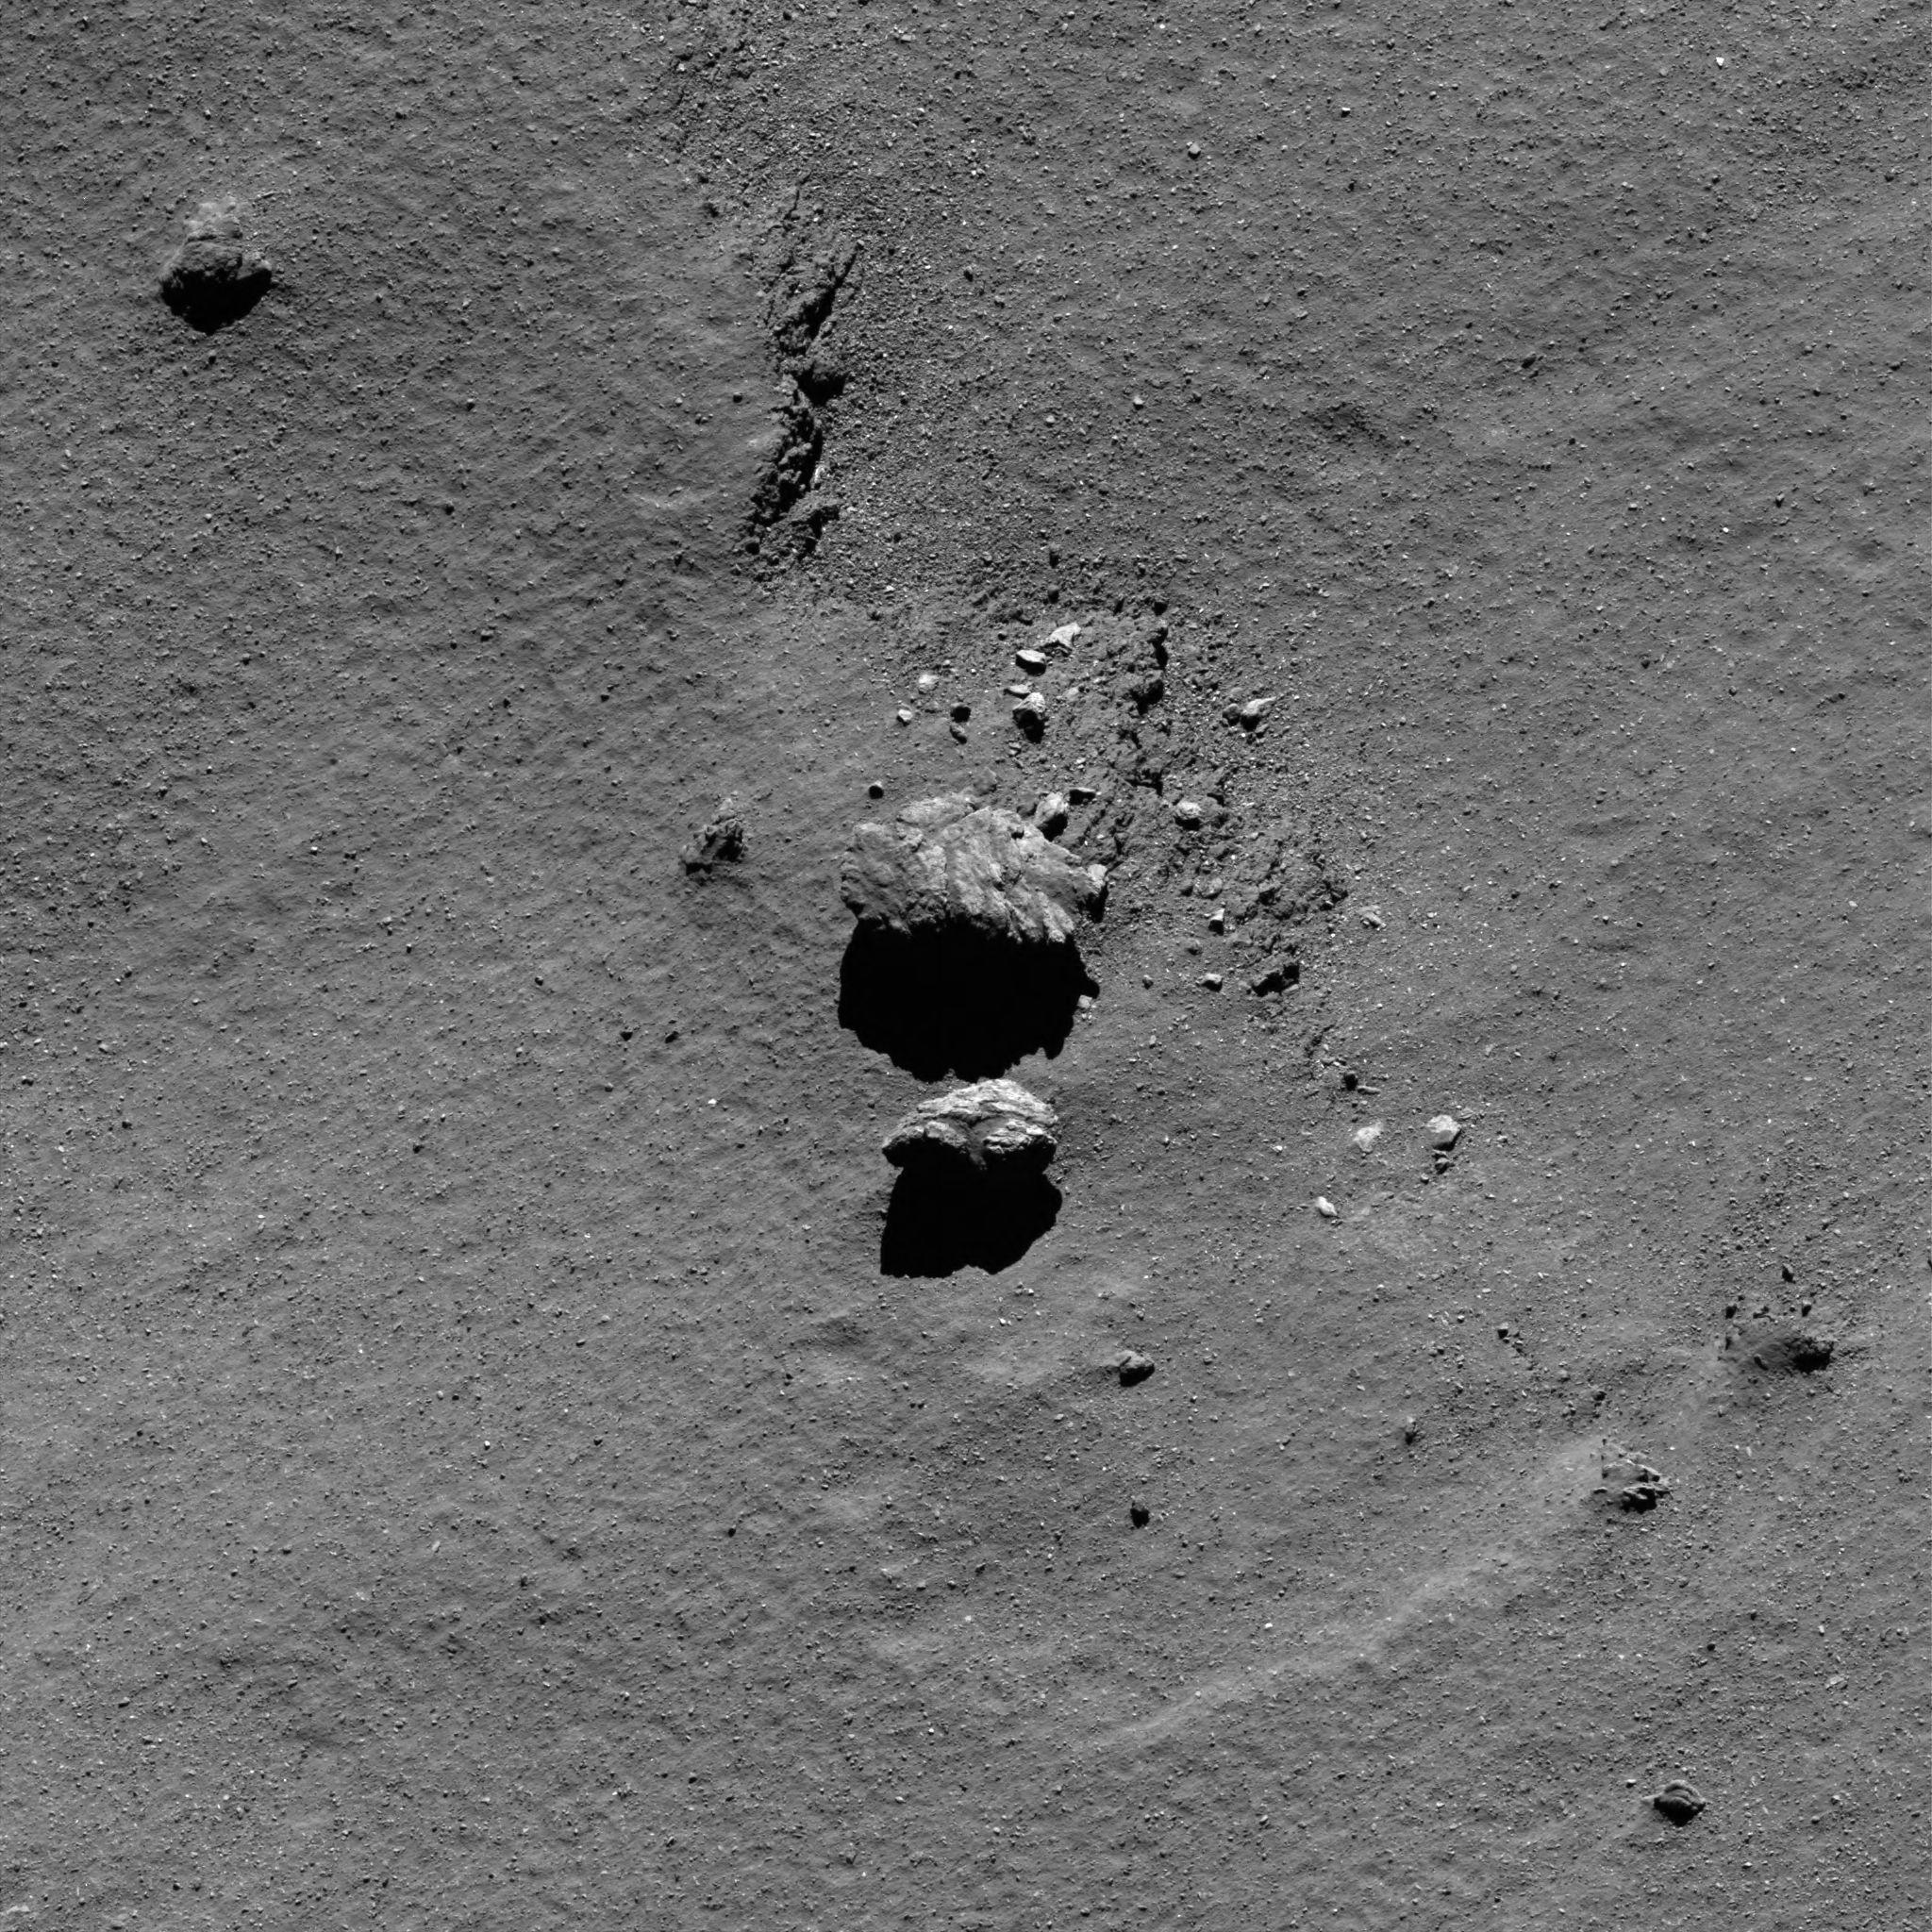 1567215482730-Rosetta_OSIRIS_NAC_comet_67P_20160818T215748.jpg